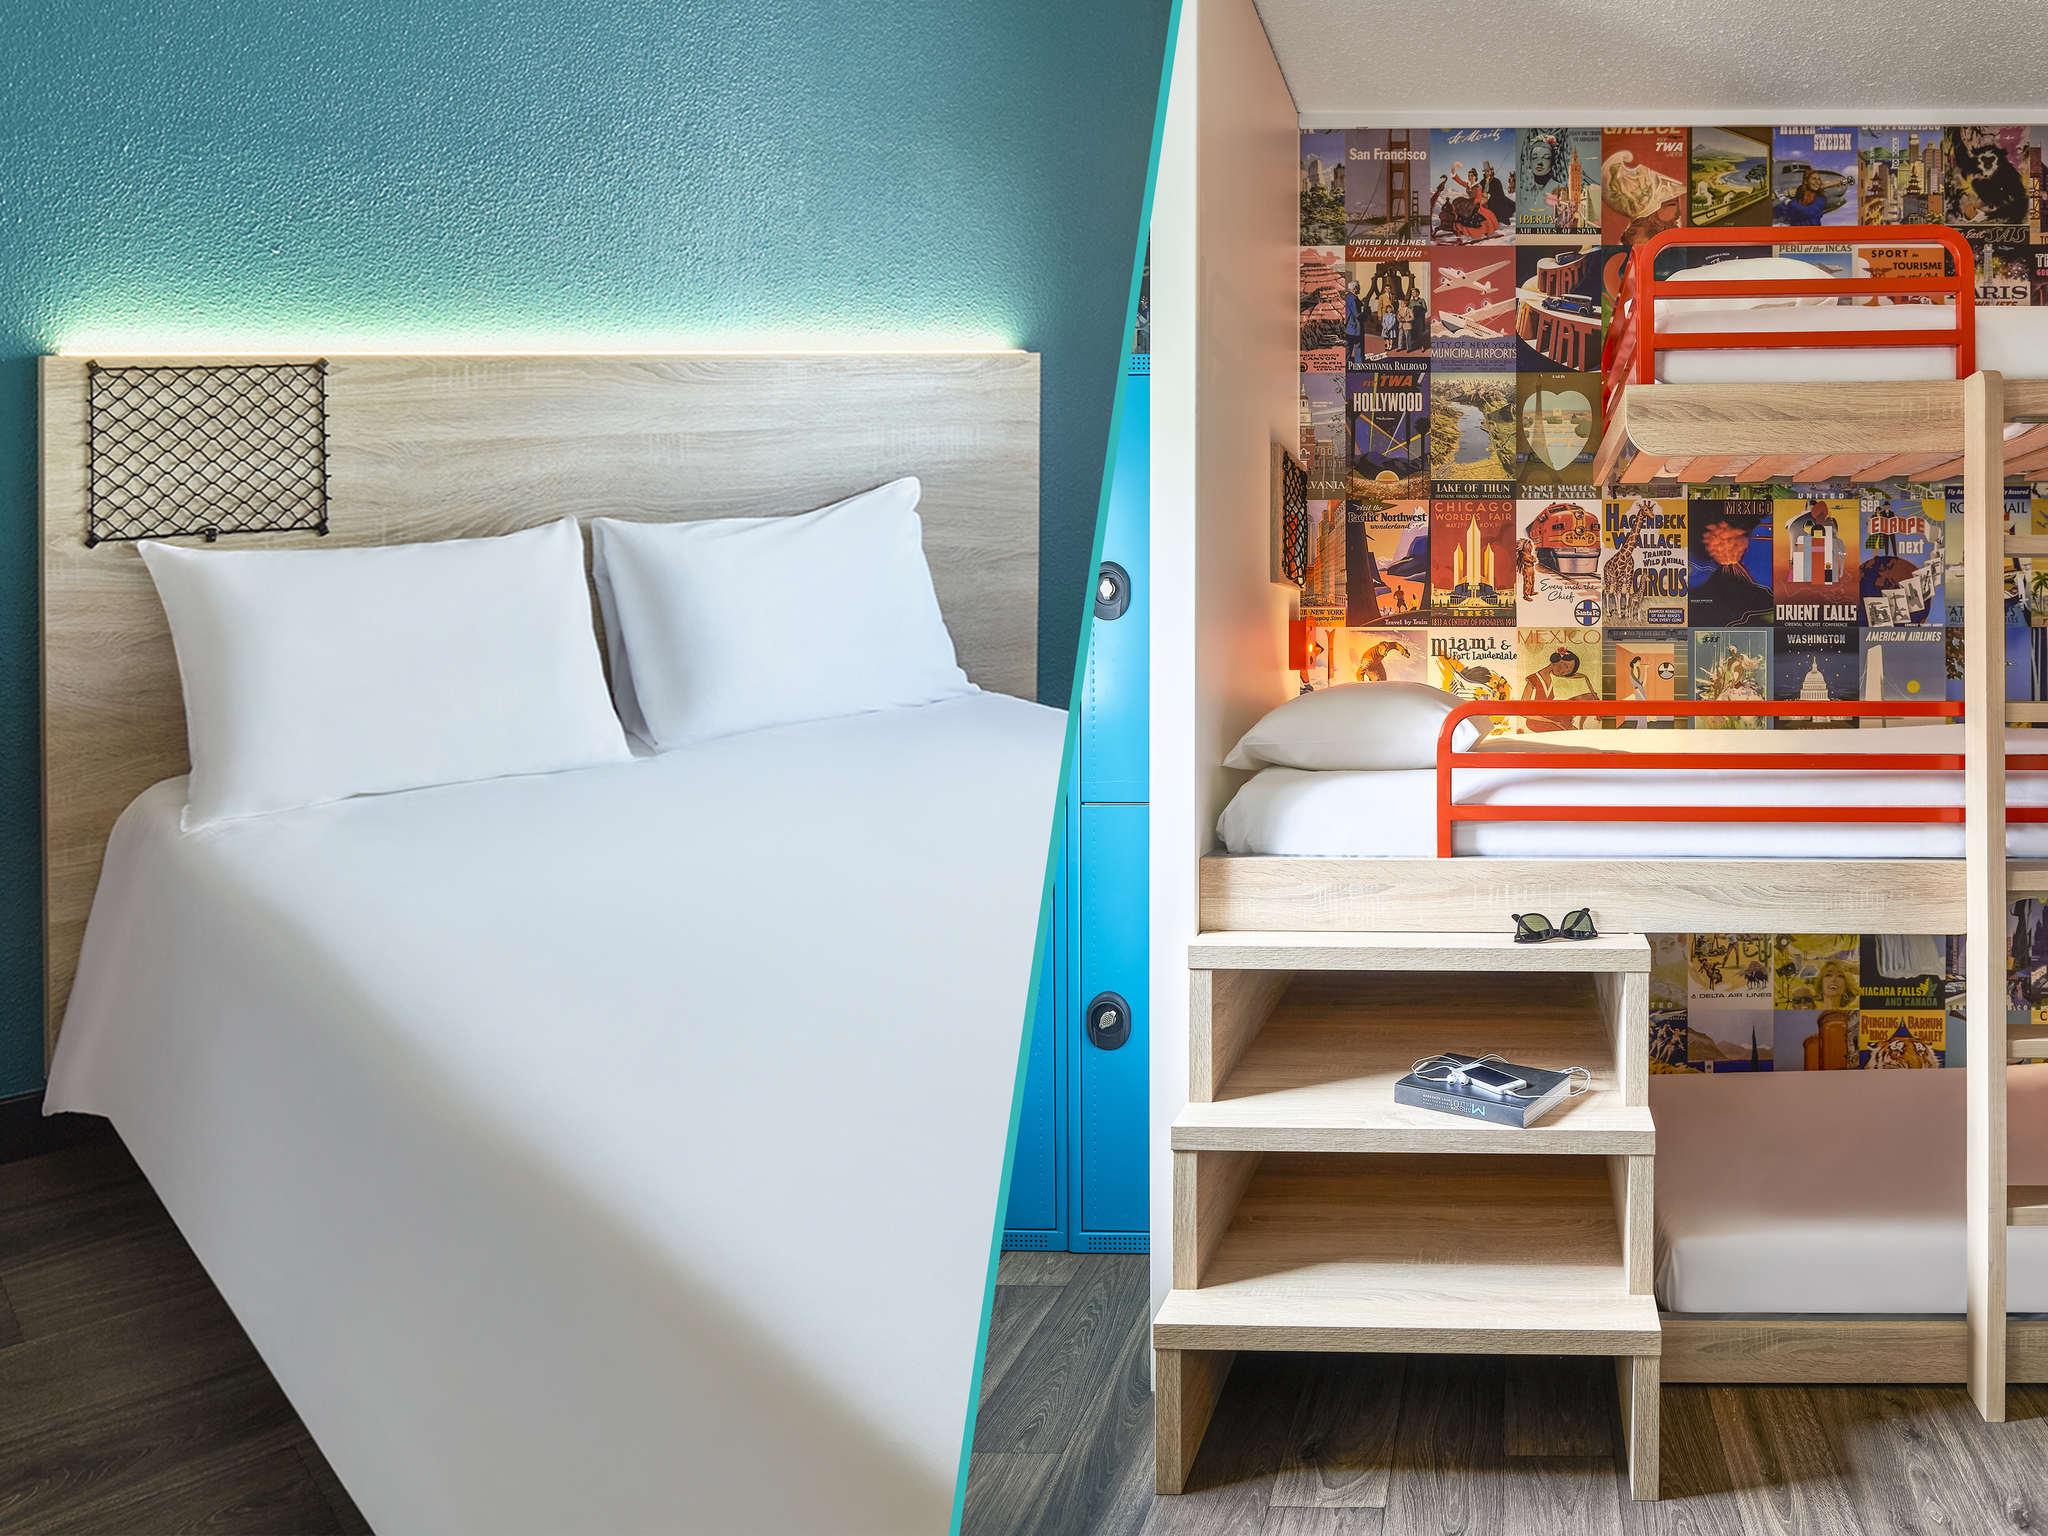 Отель — hotelF1 Paris Porte de Châtillon (rénové)